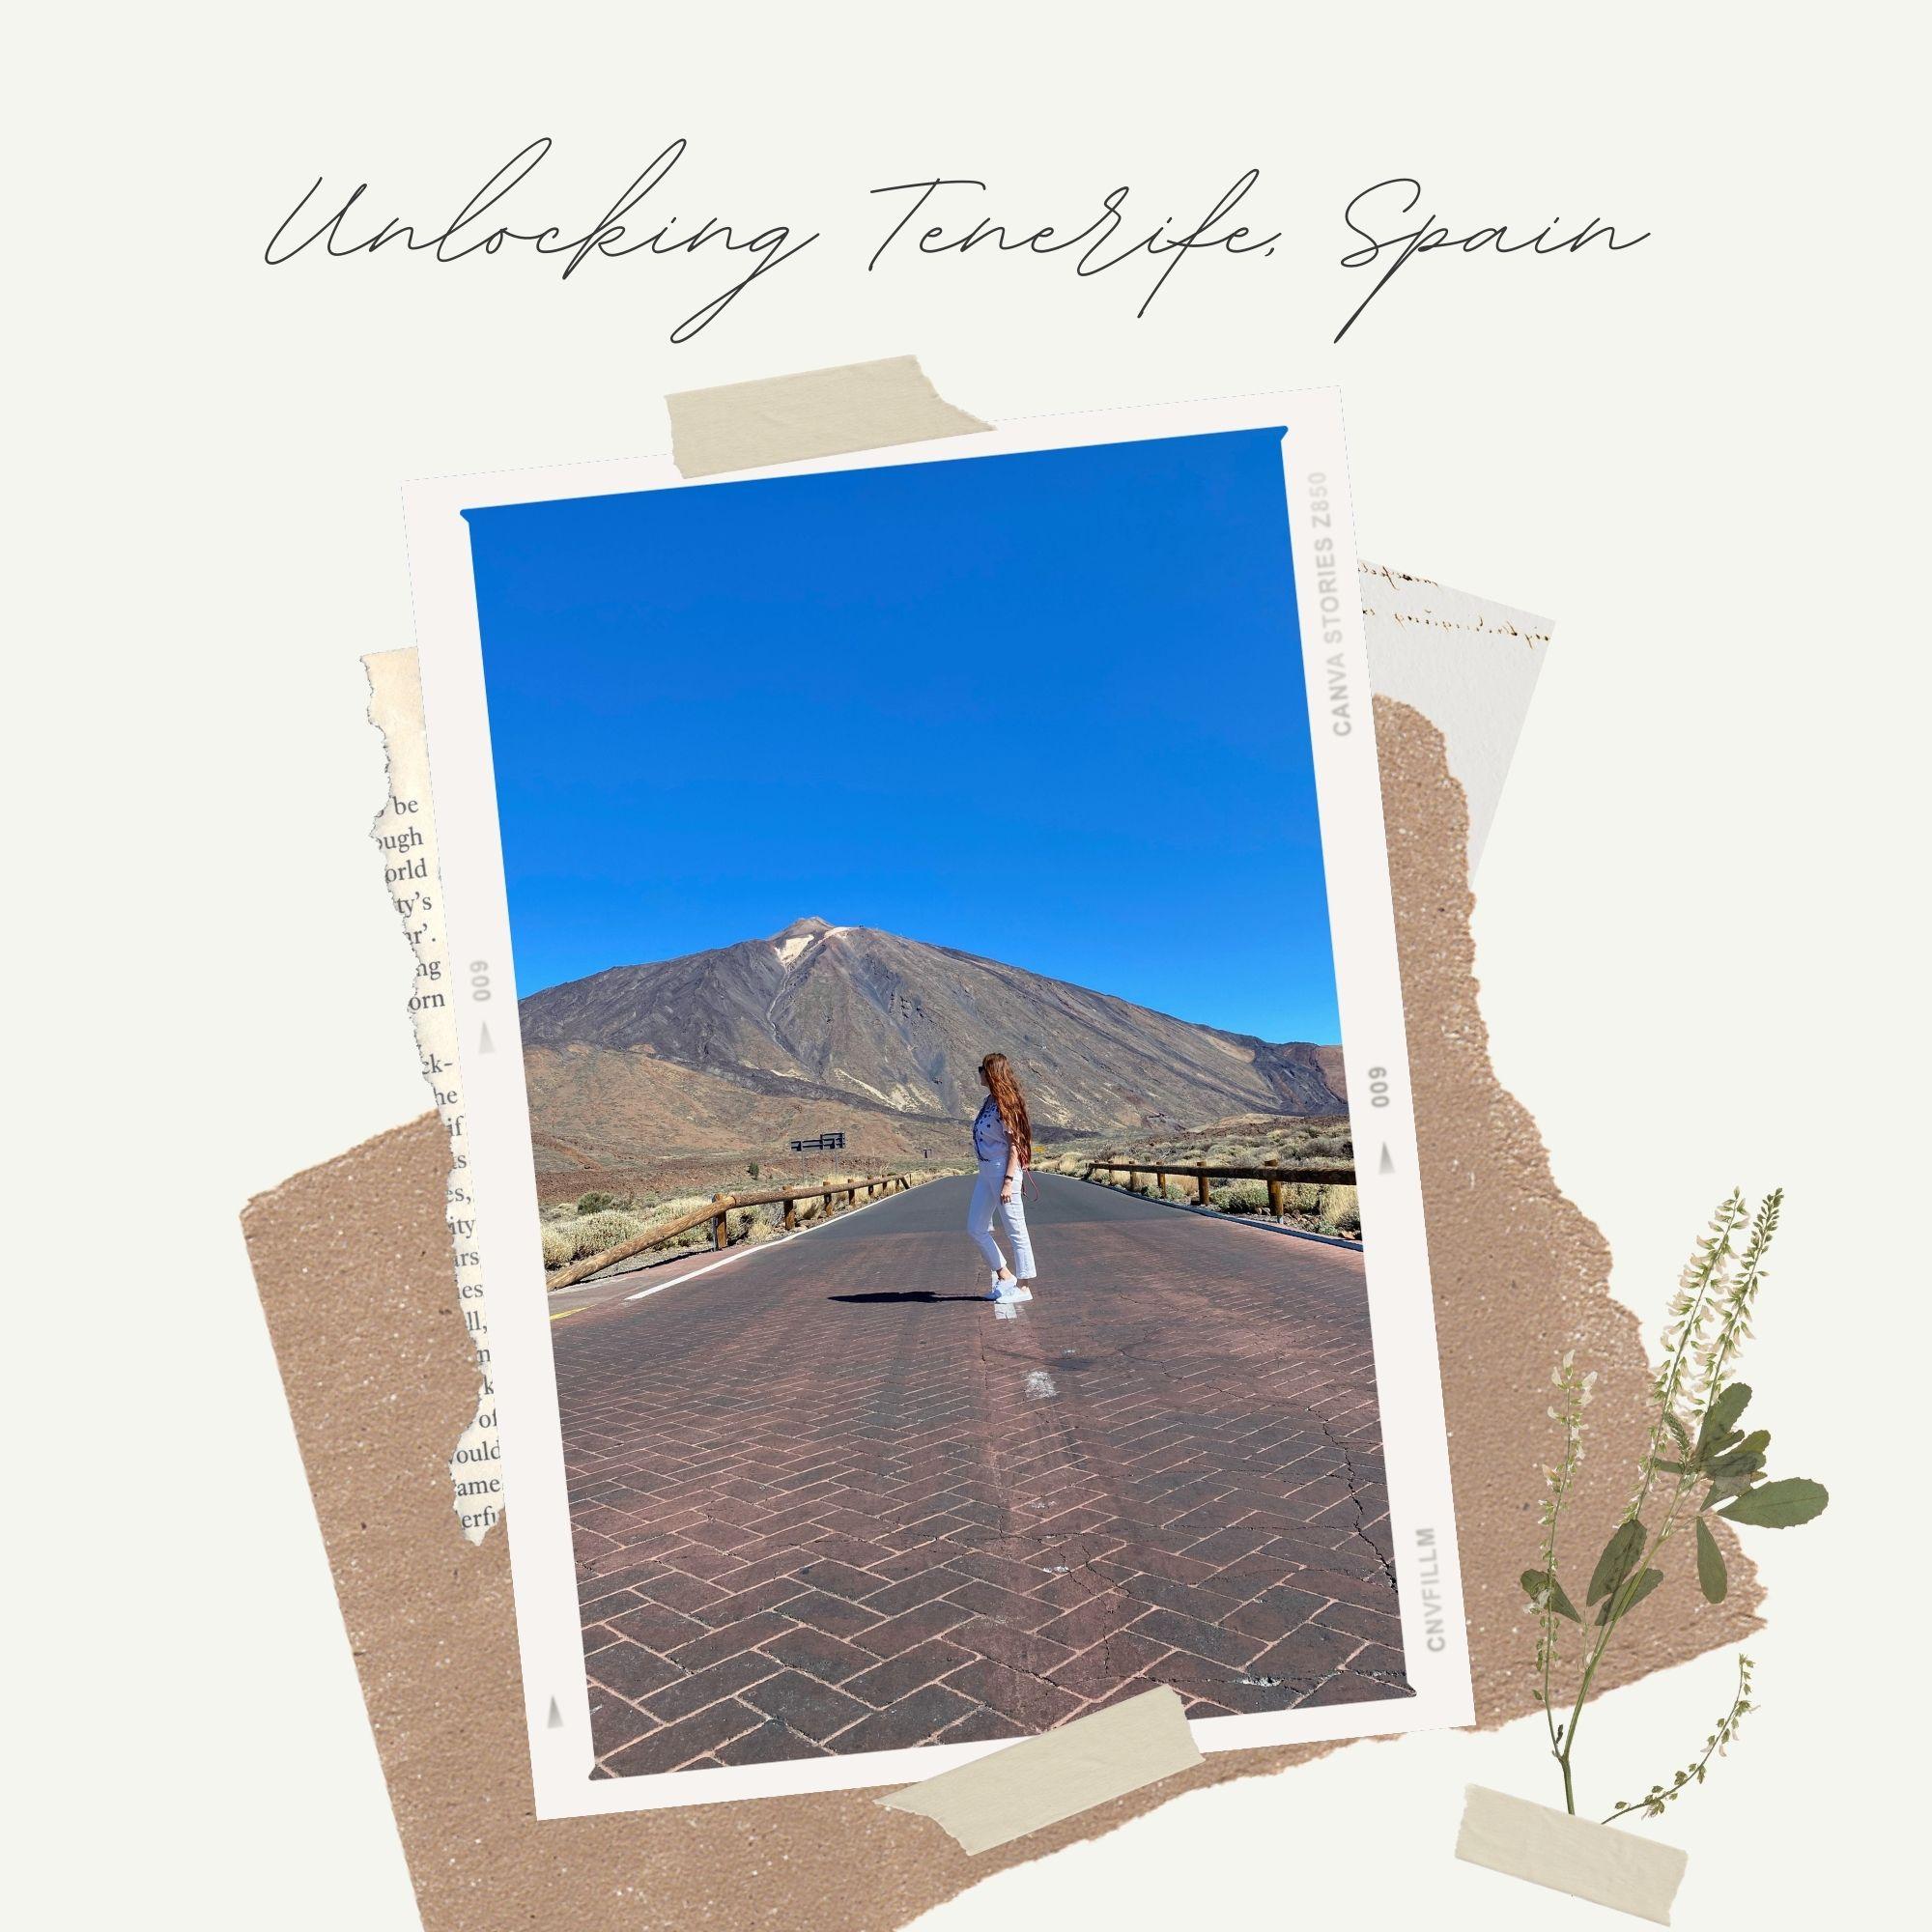 Traveling: Unlocking Tenerife, Spain